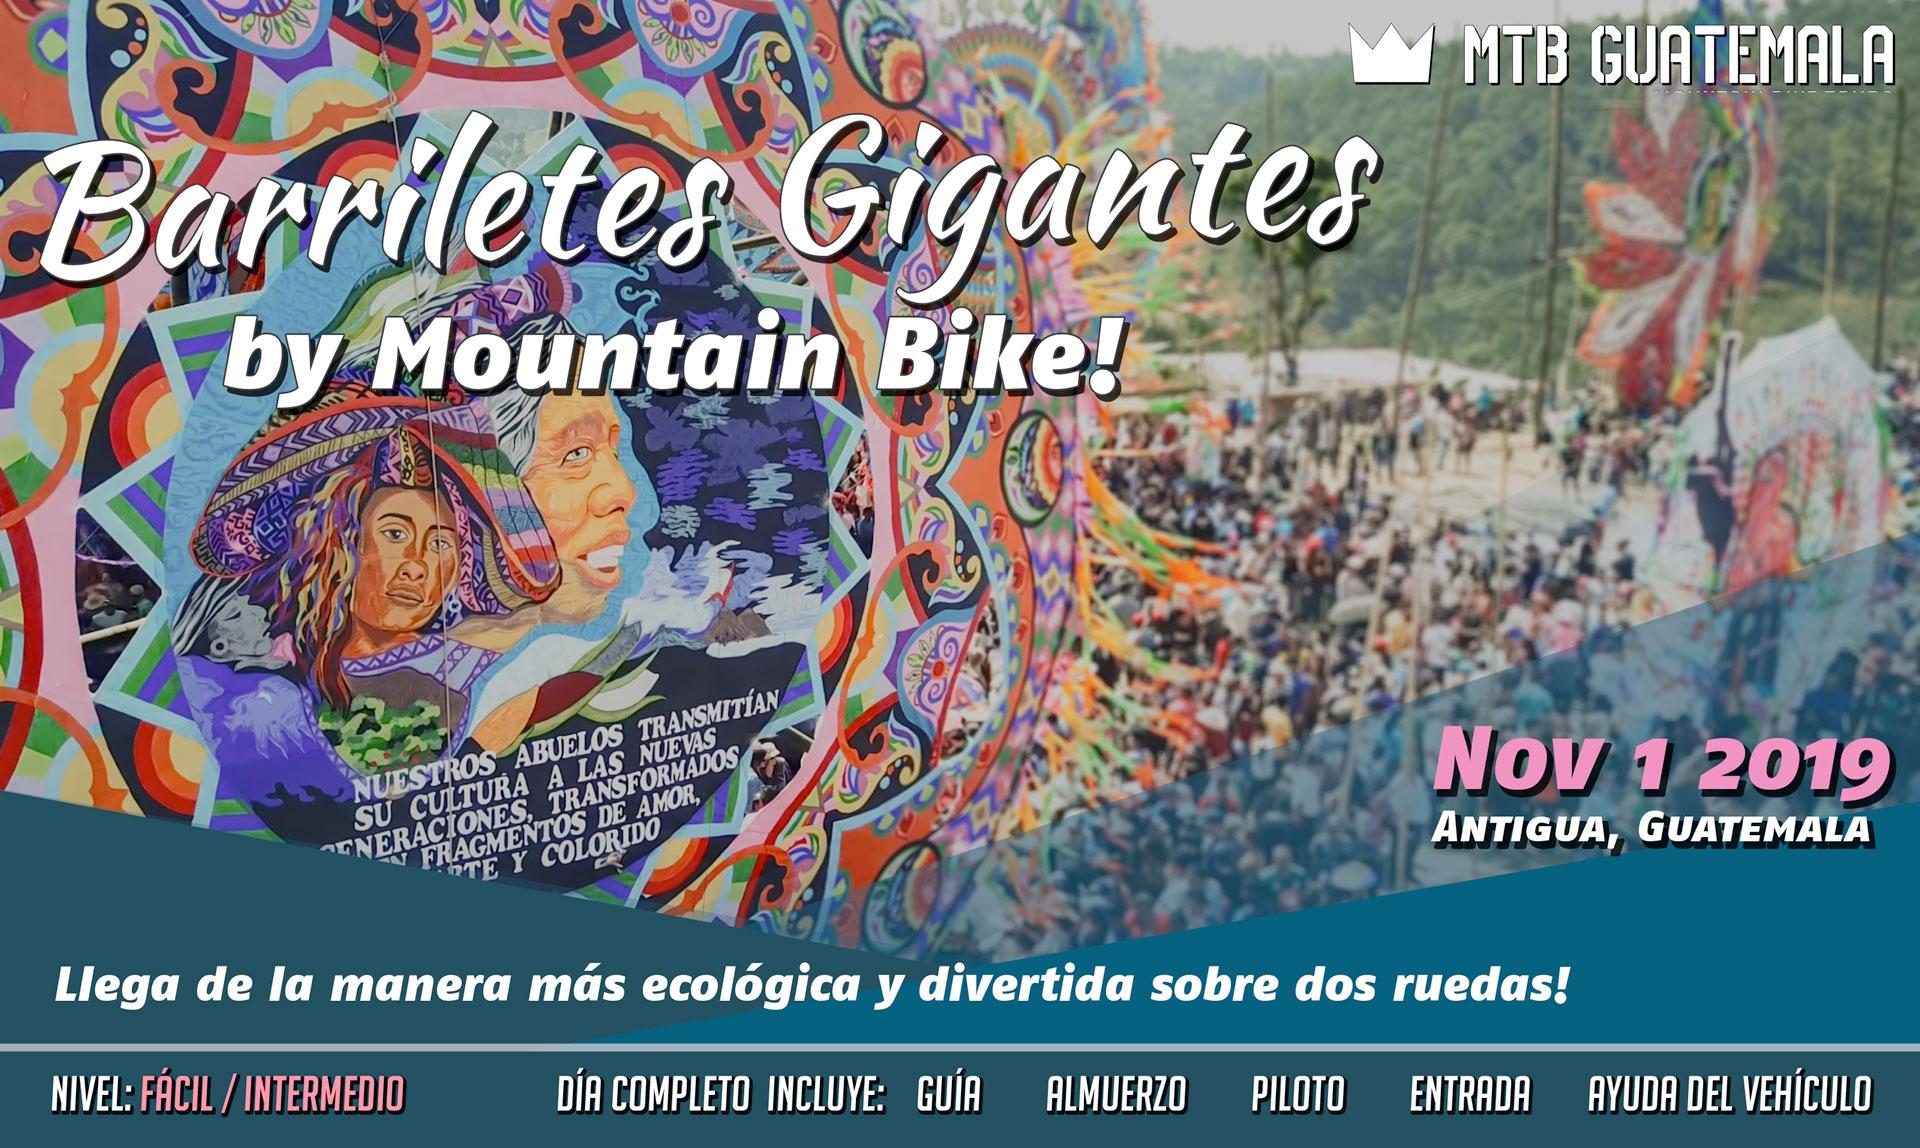 MTB Guatemala - Festival de Barriletes Gigantes